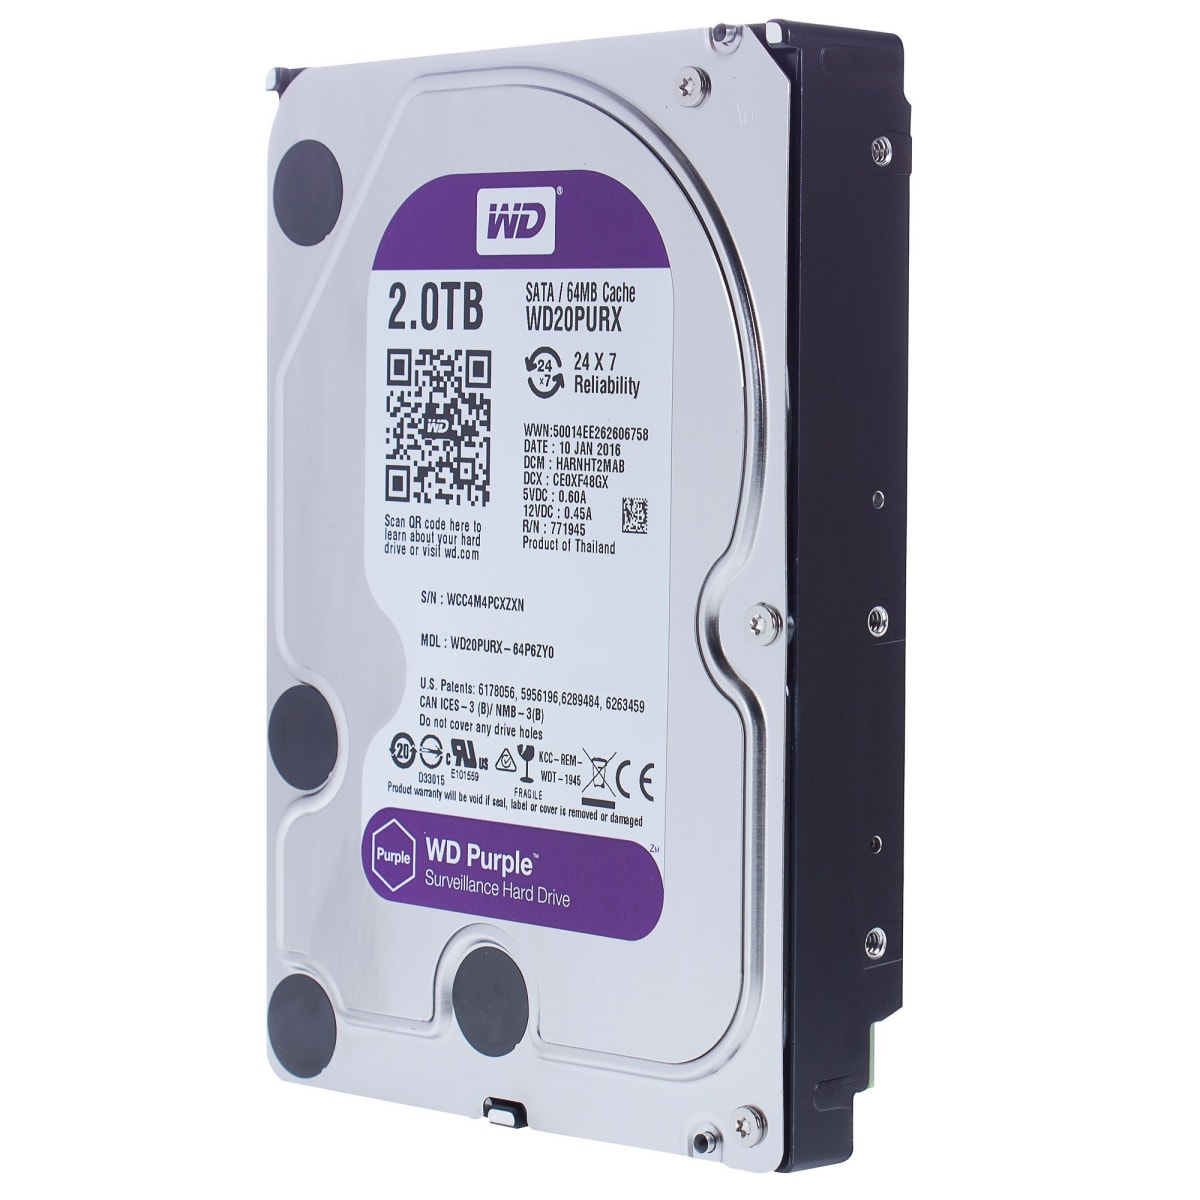 Жесткий диск Western Digital 2 Tb, 17x11x2 см, алюминий/сталь